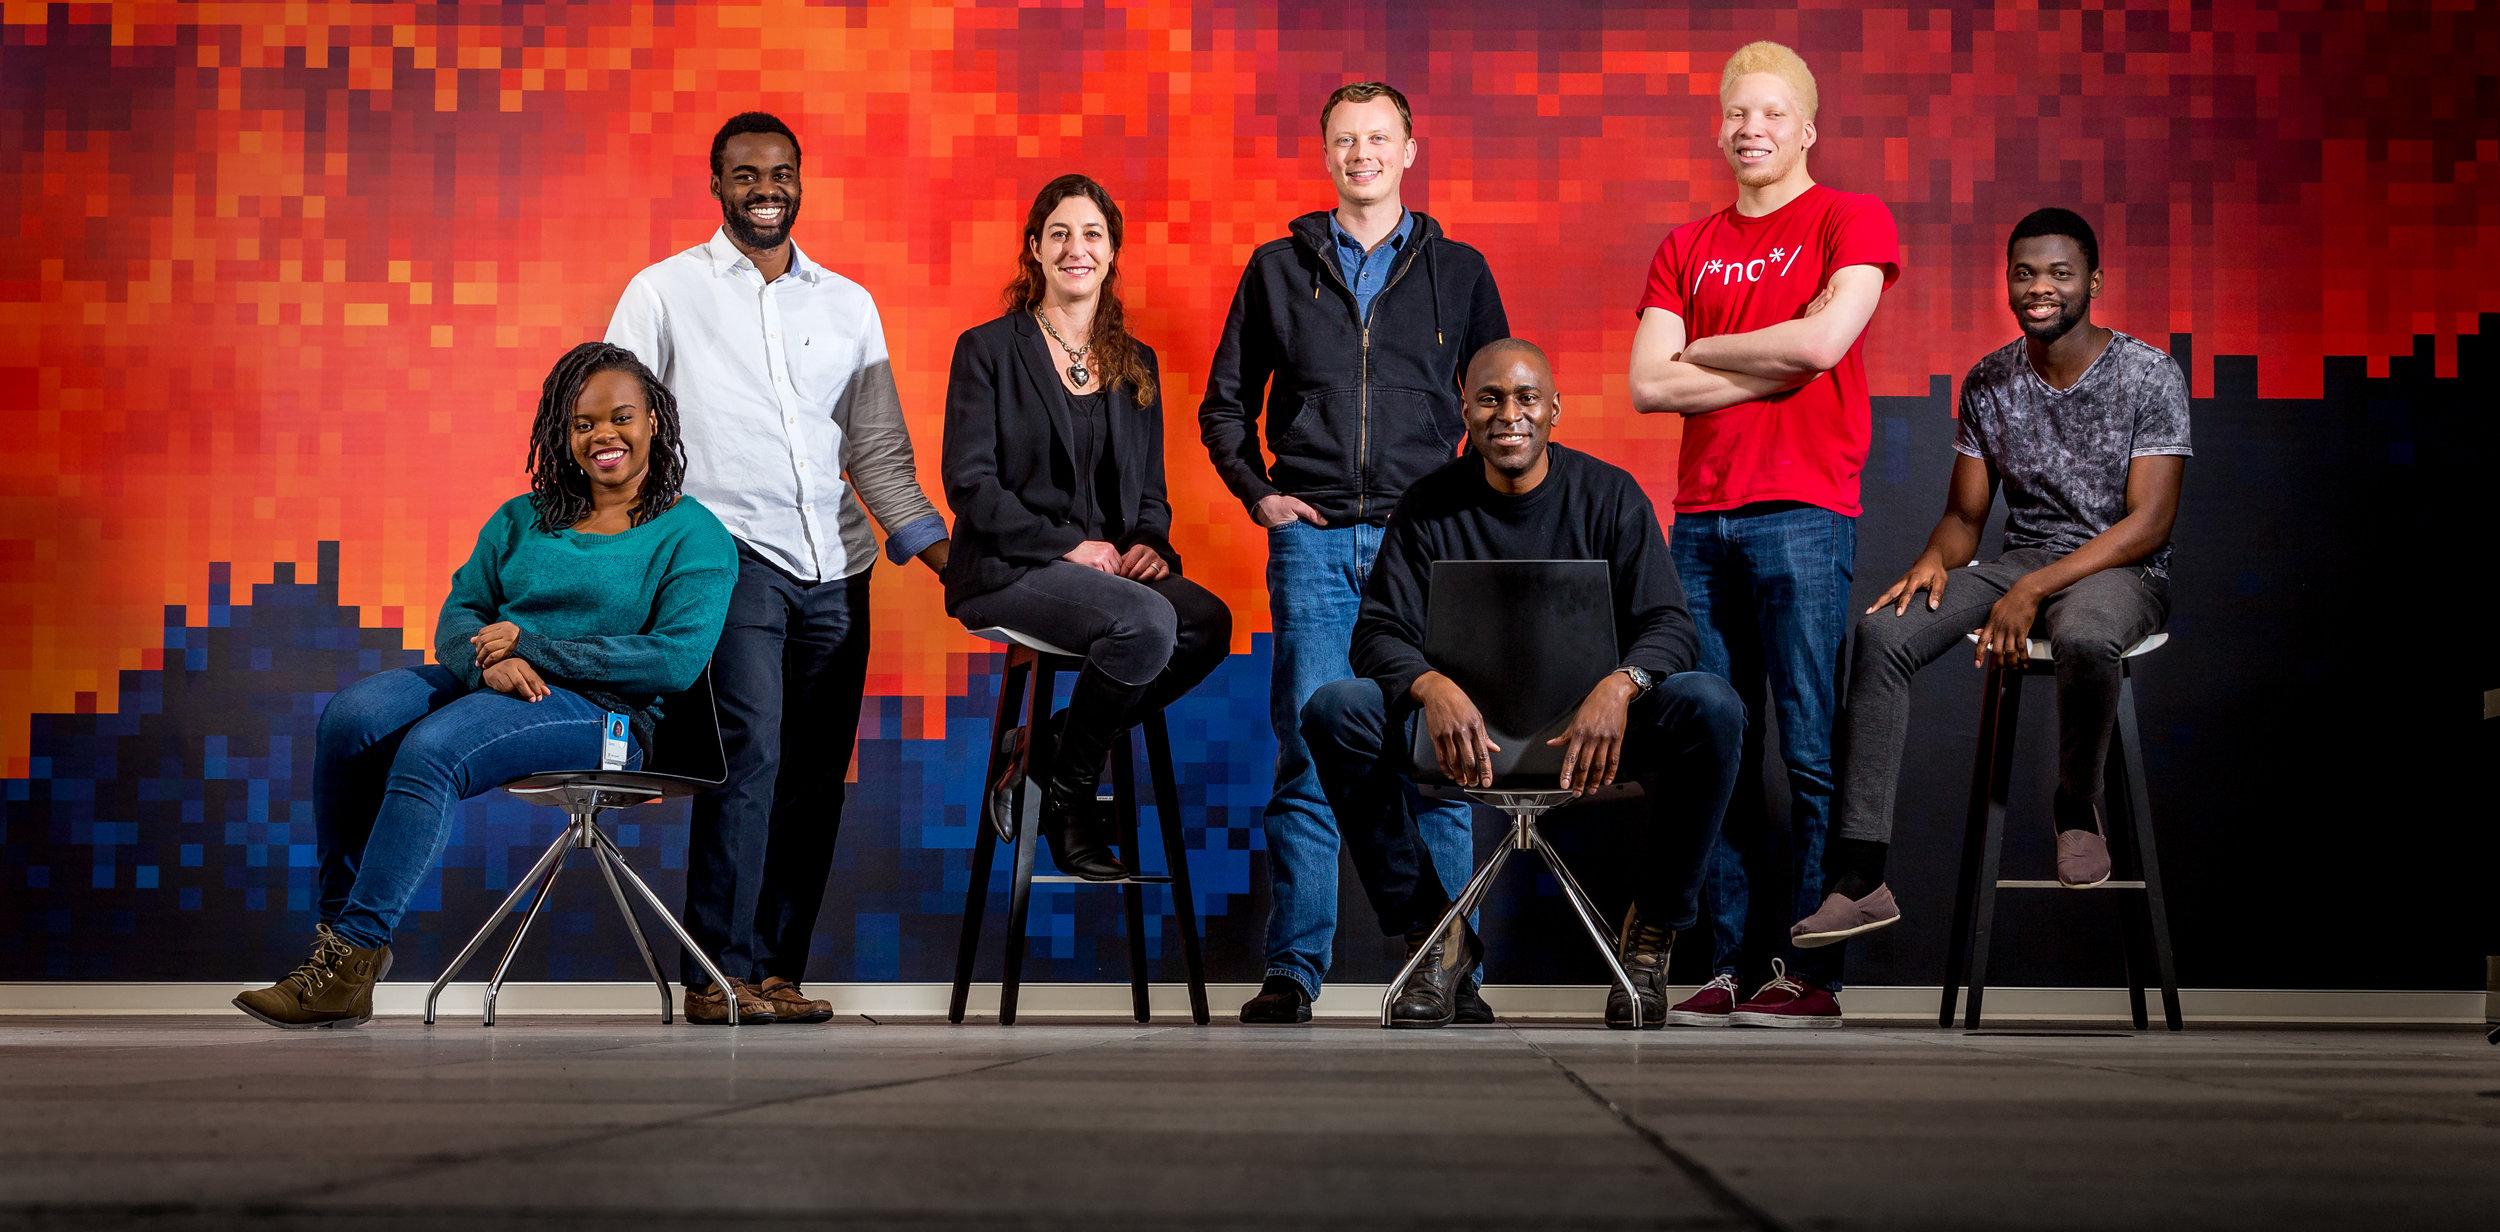 Microsoft-Diversity-Group-07.JPG